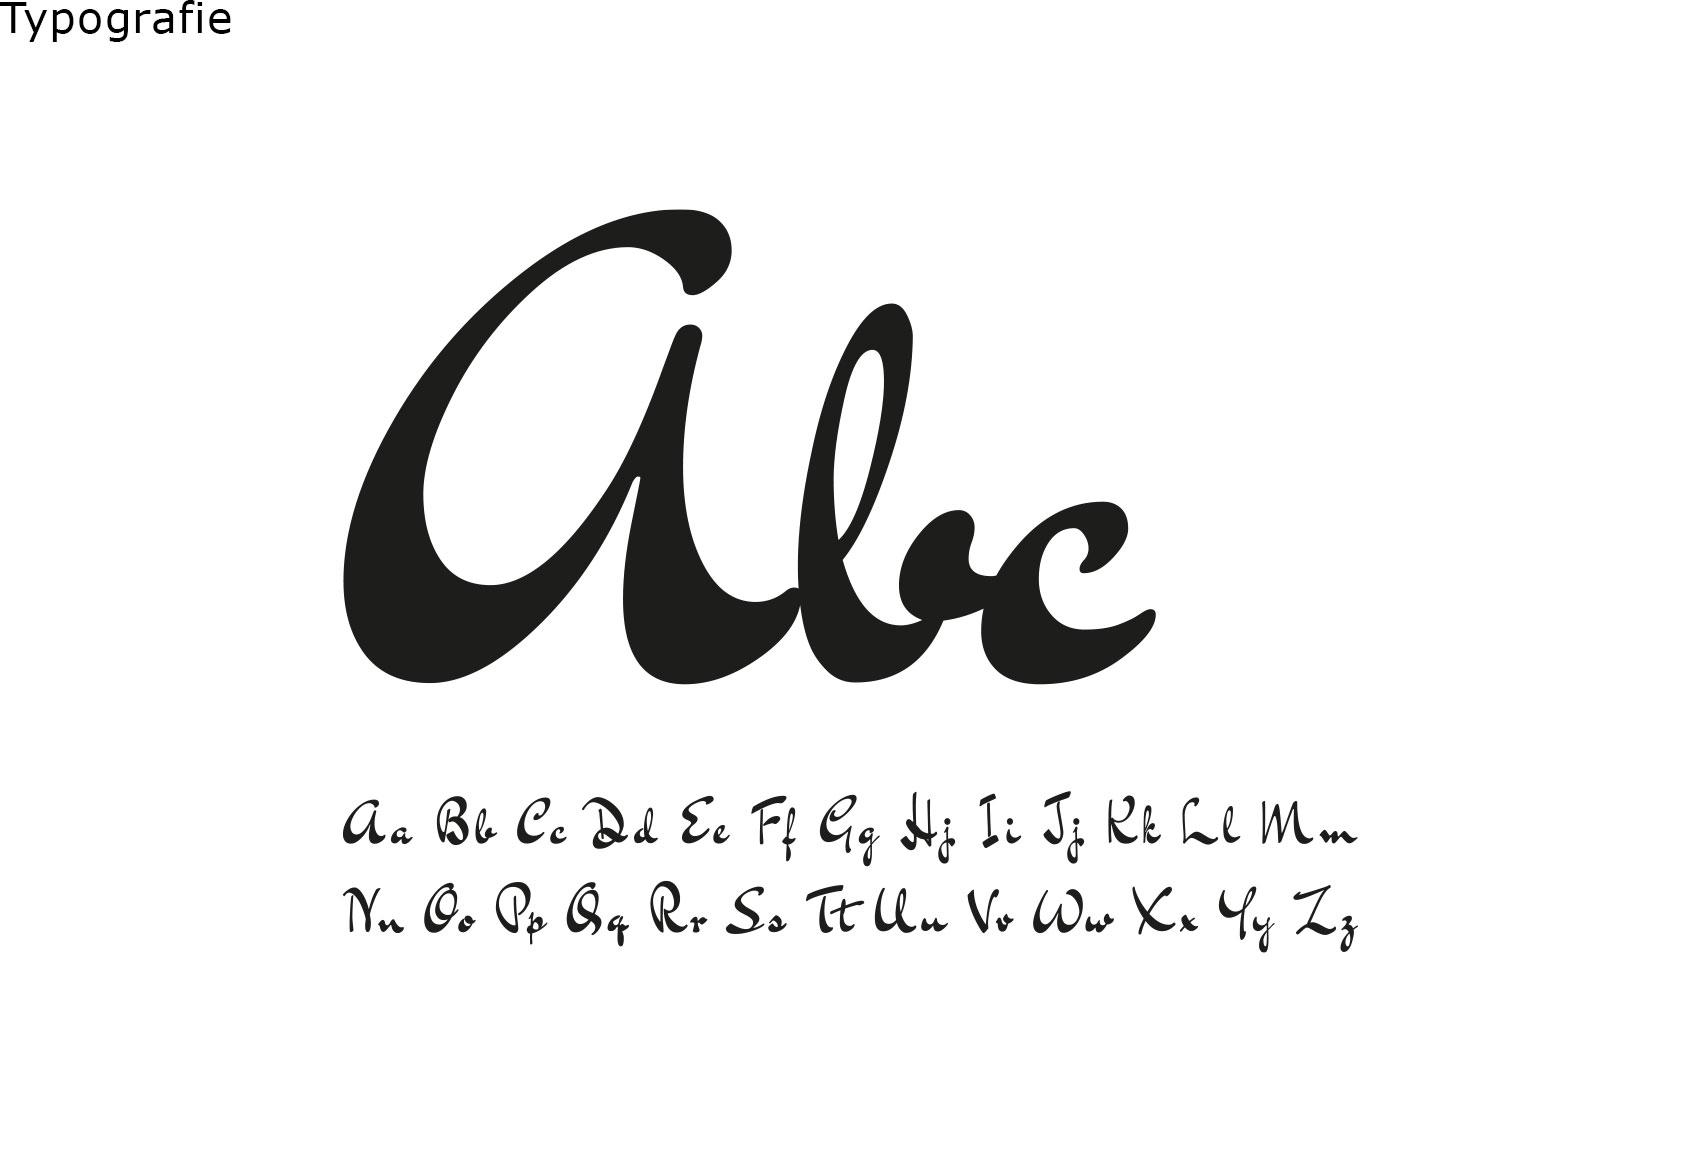 typografie_stfscholz